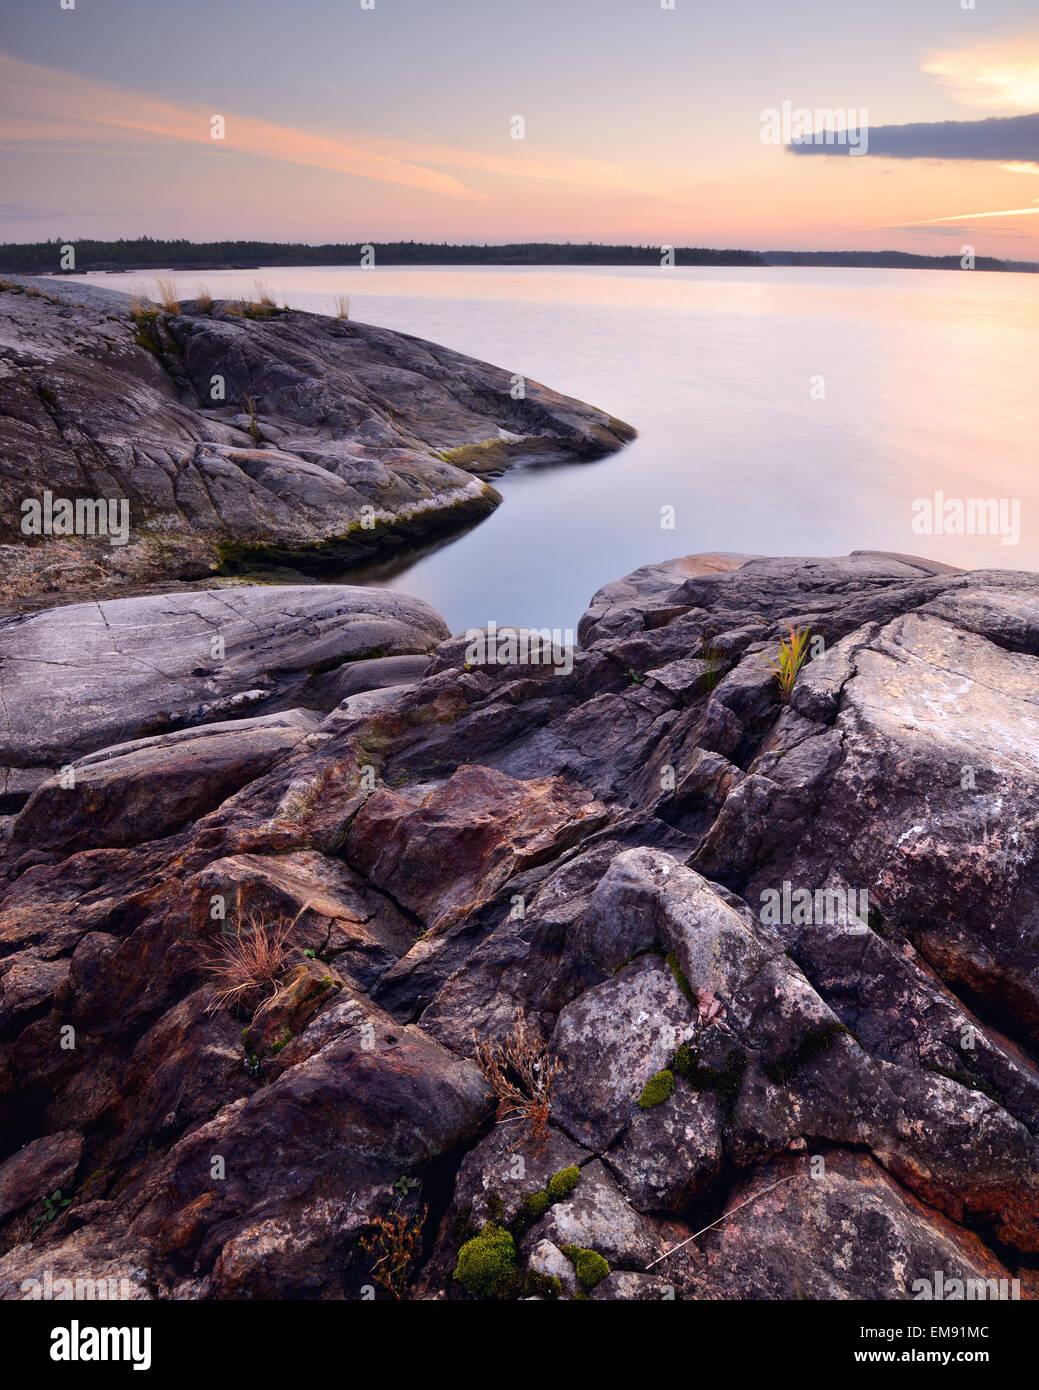 Rocks on Iso Koirasaari Island at sunset, Ladoga Lake, Republic of Karelia, Russia - Stock Image